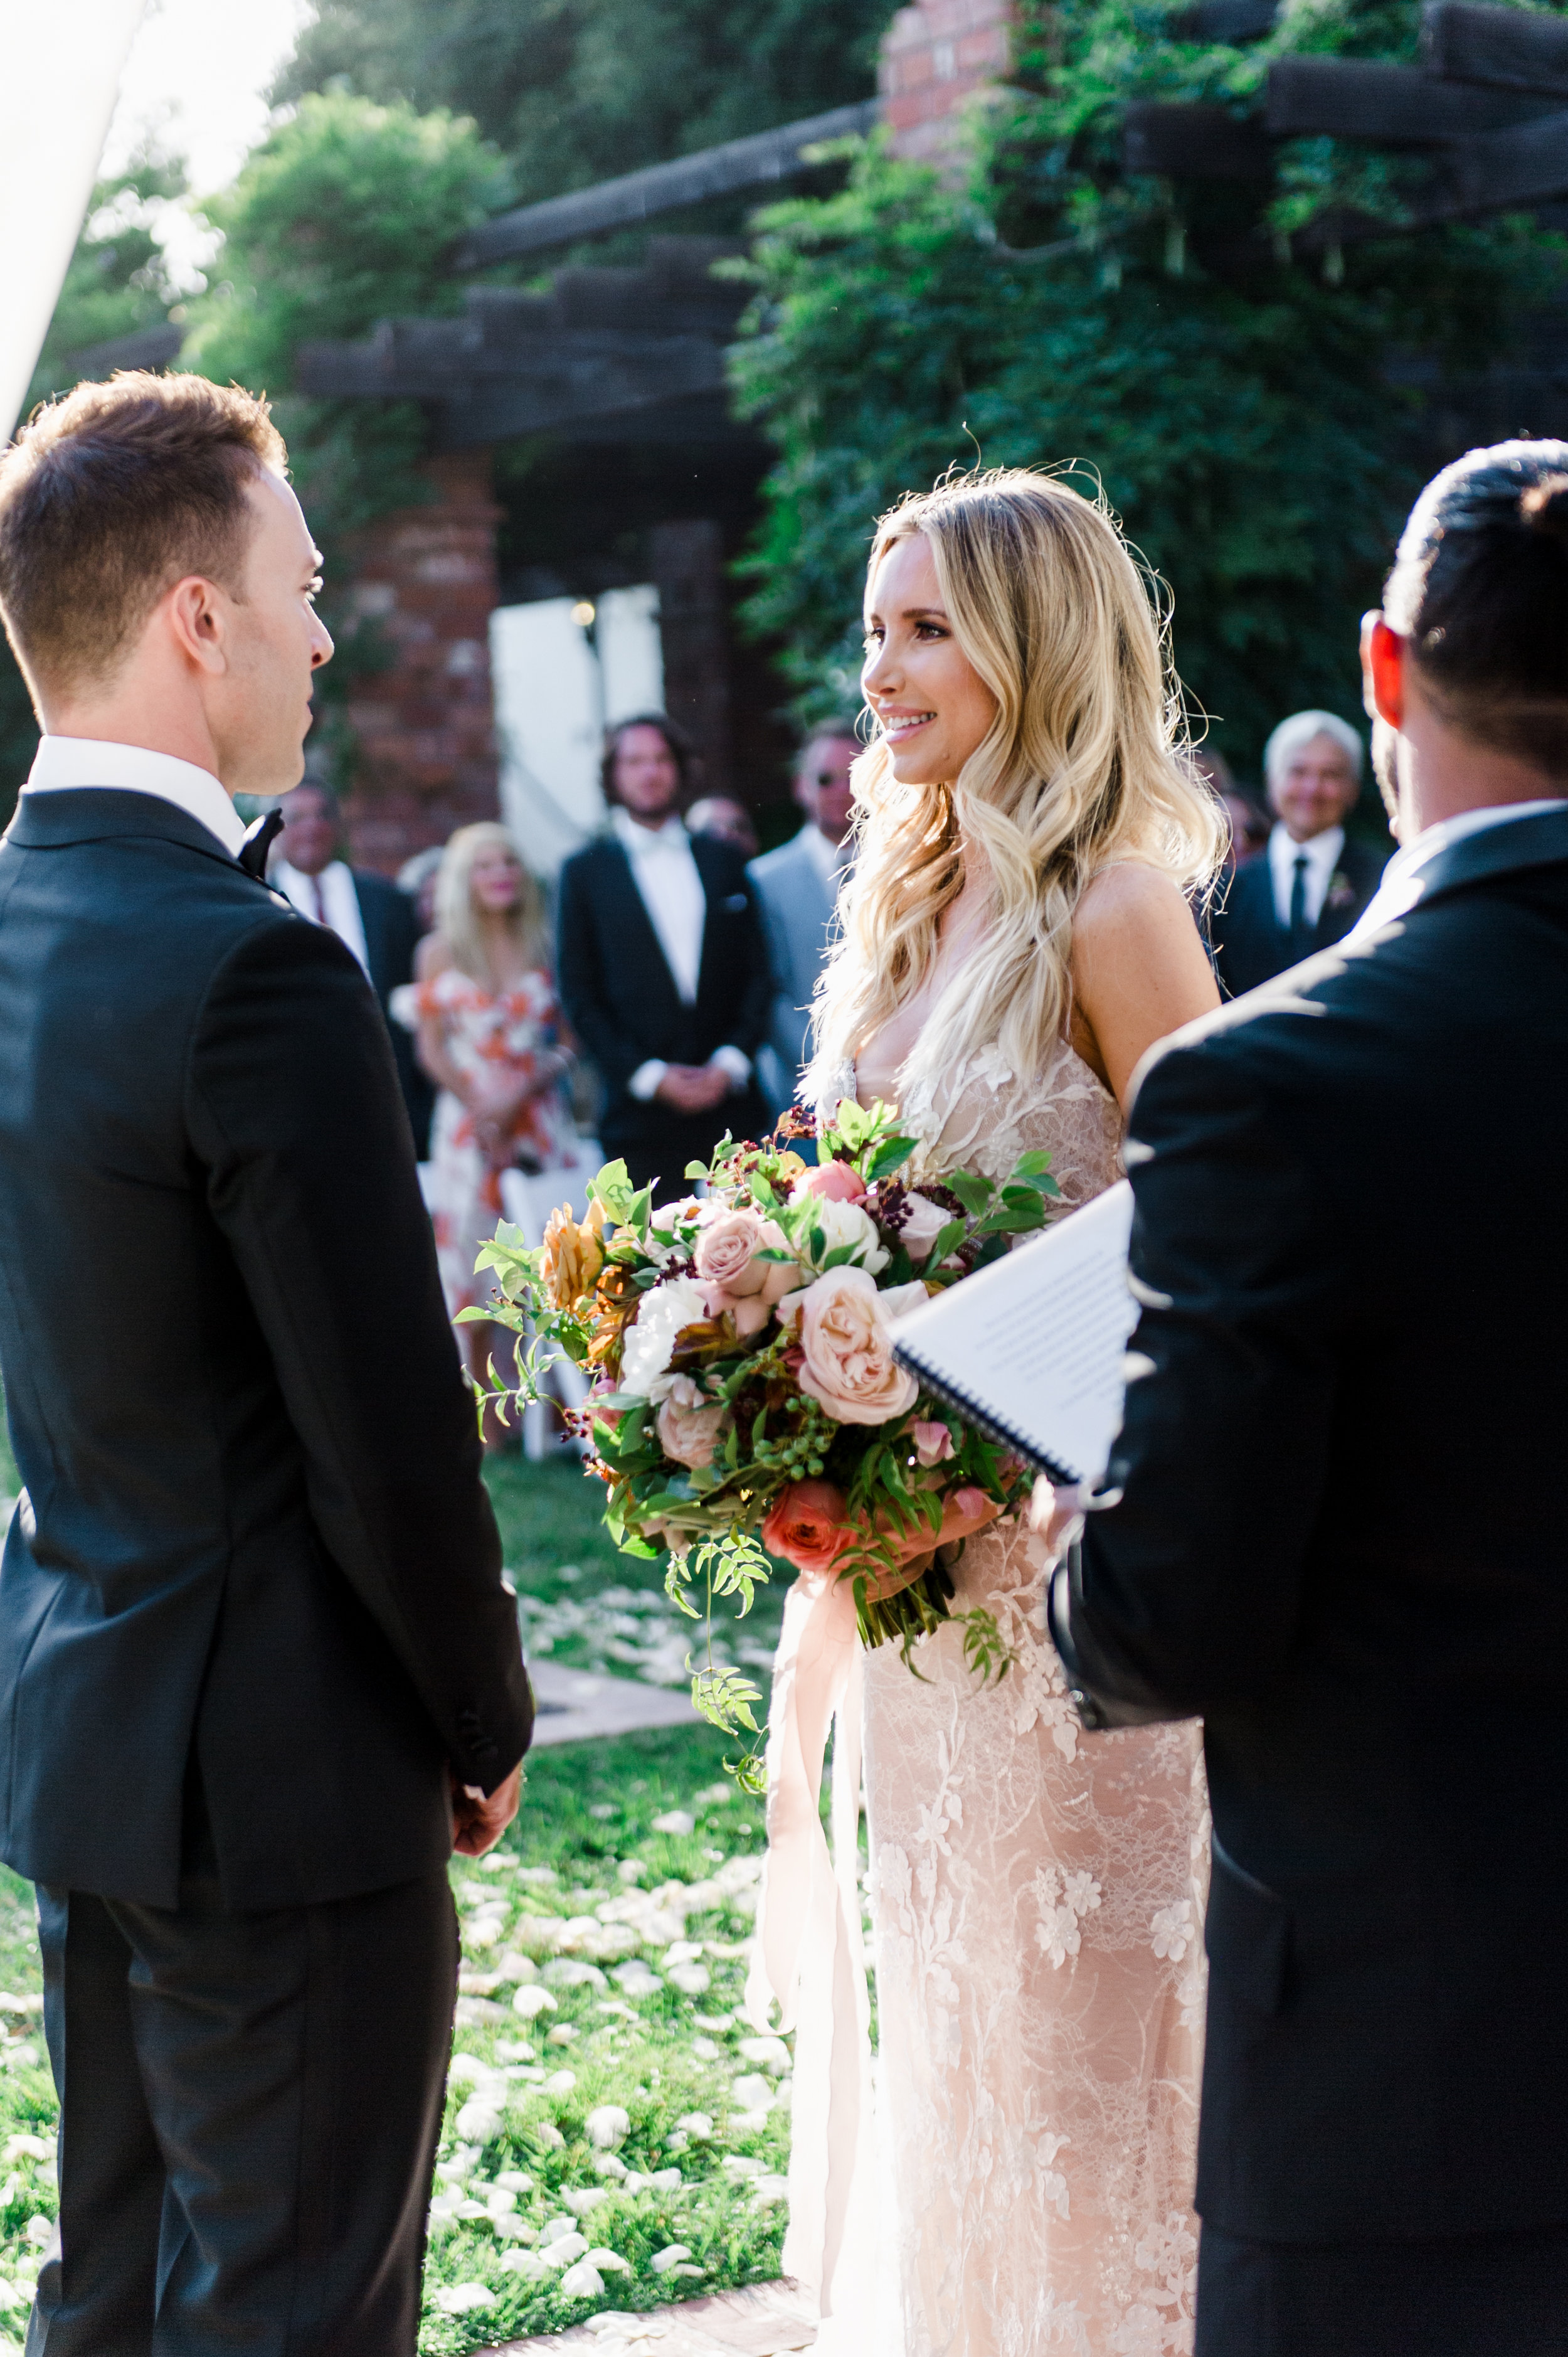 www.santabarbarawedding.com | Belmond El Encanto | Event of the Season | Taryn Grey Photo | Bride and Groom | Ceremony | Vows